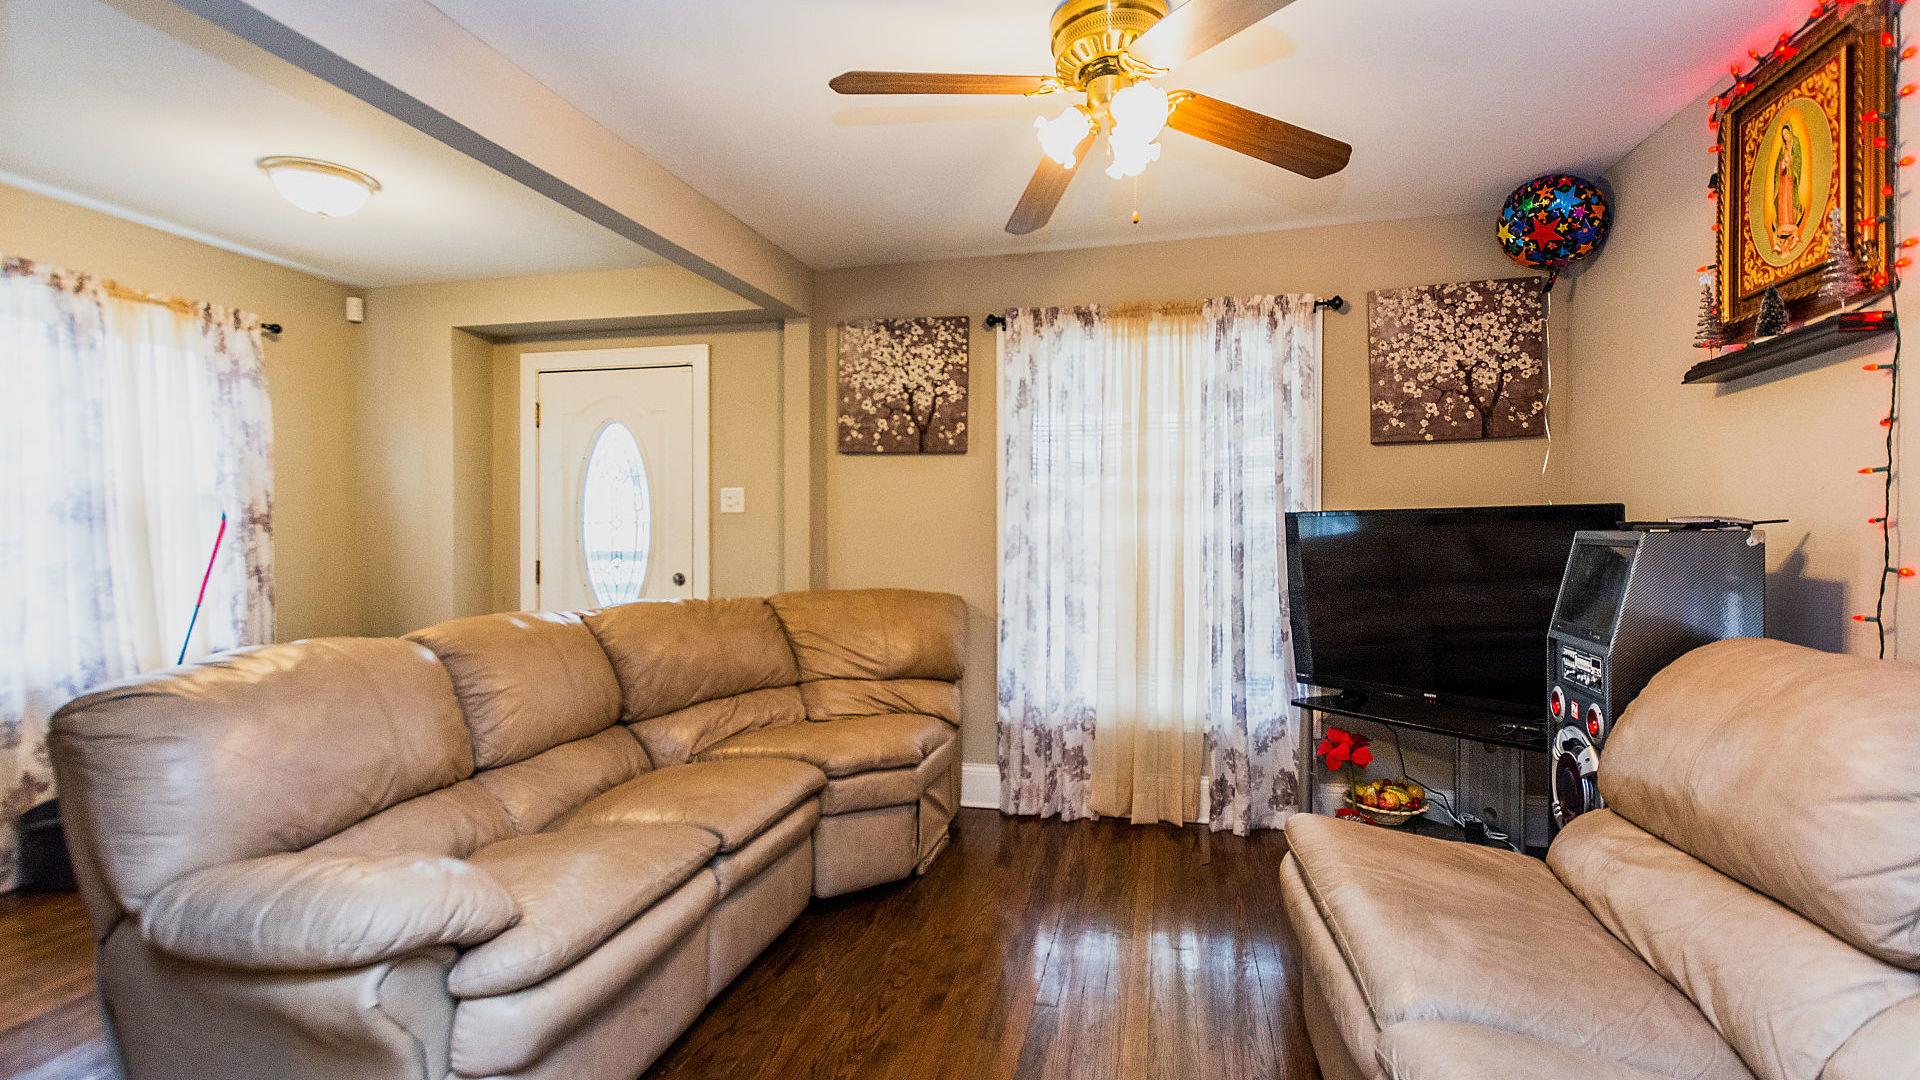 812 South 9th, Maywood, Illinois, 60153